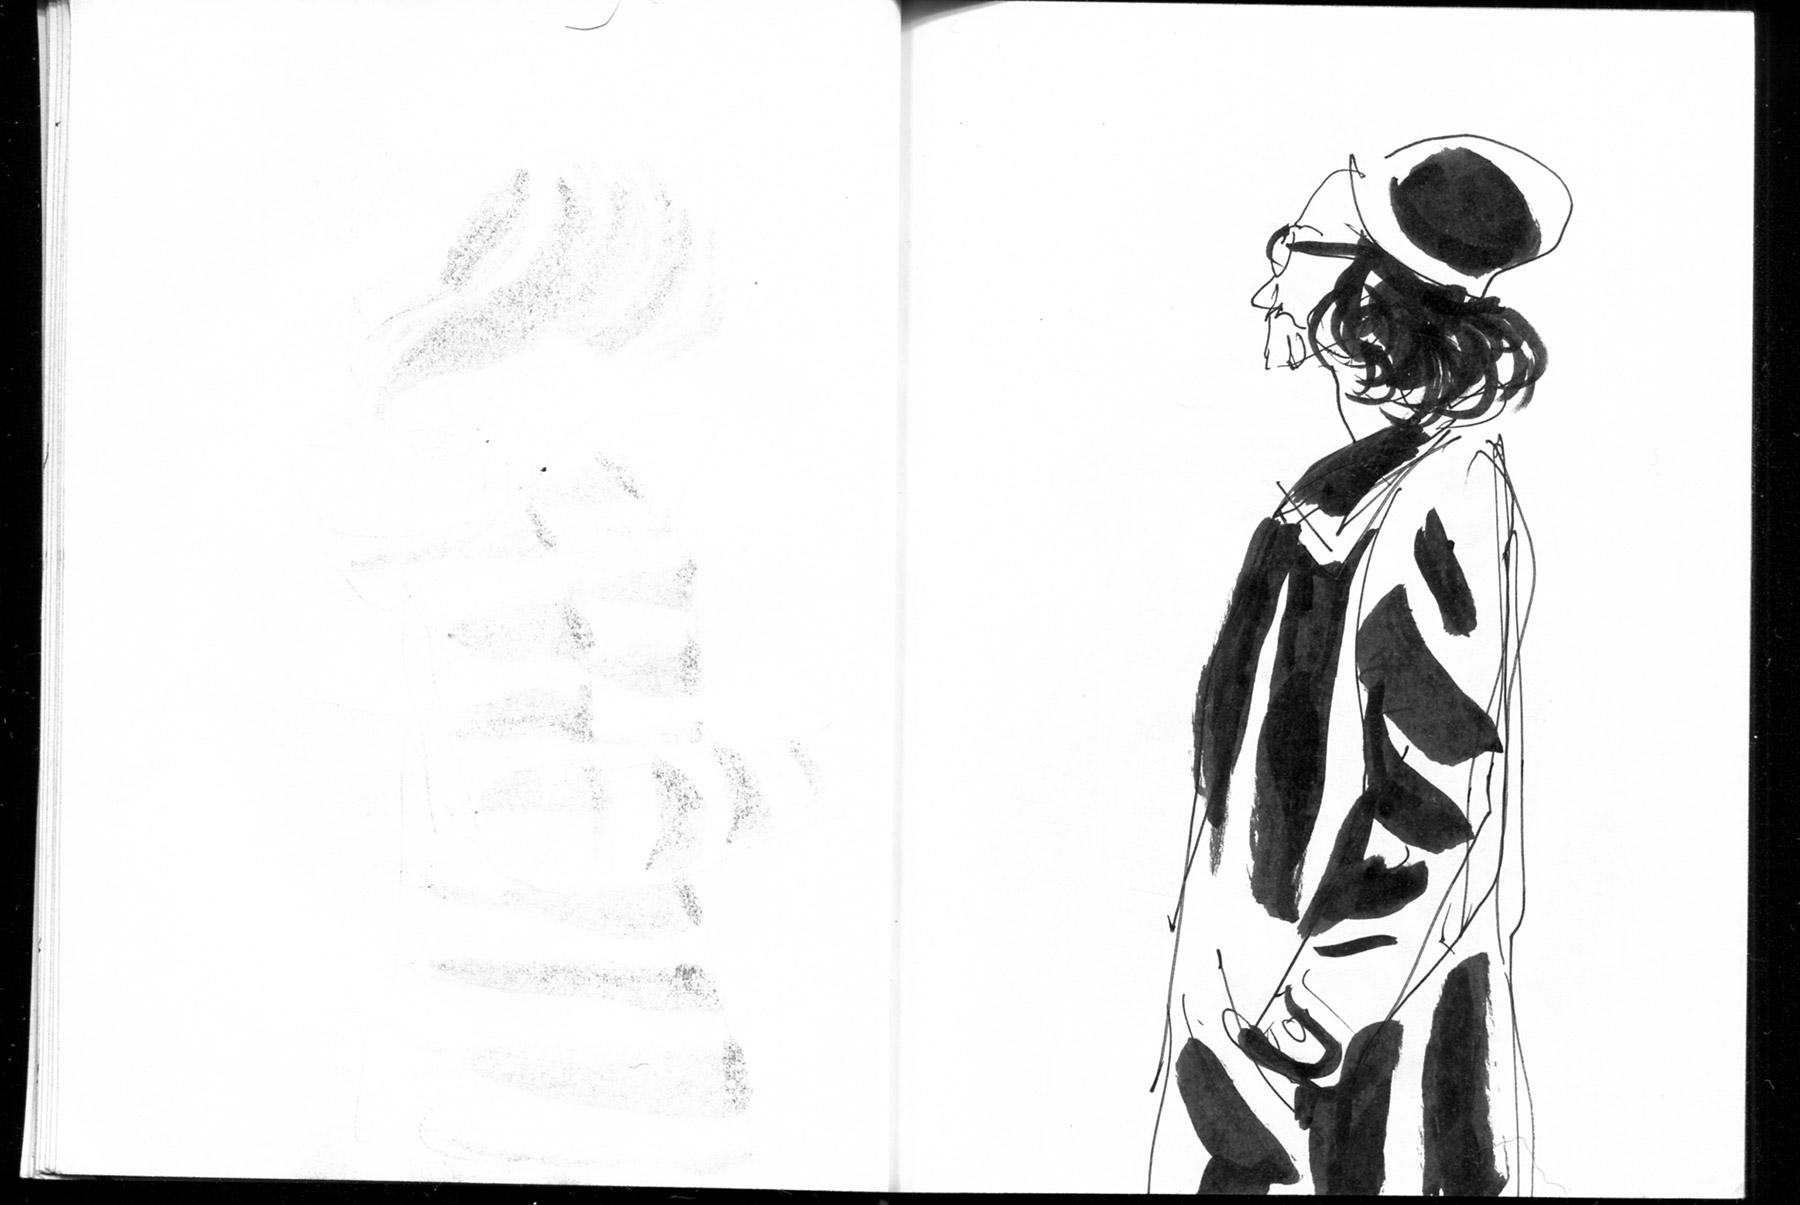 davidm_sketches_2014_08-176.jpg